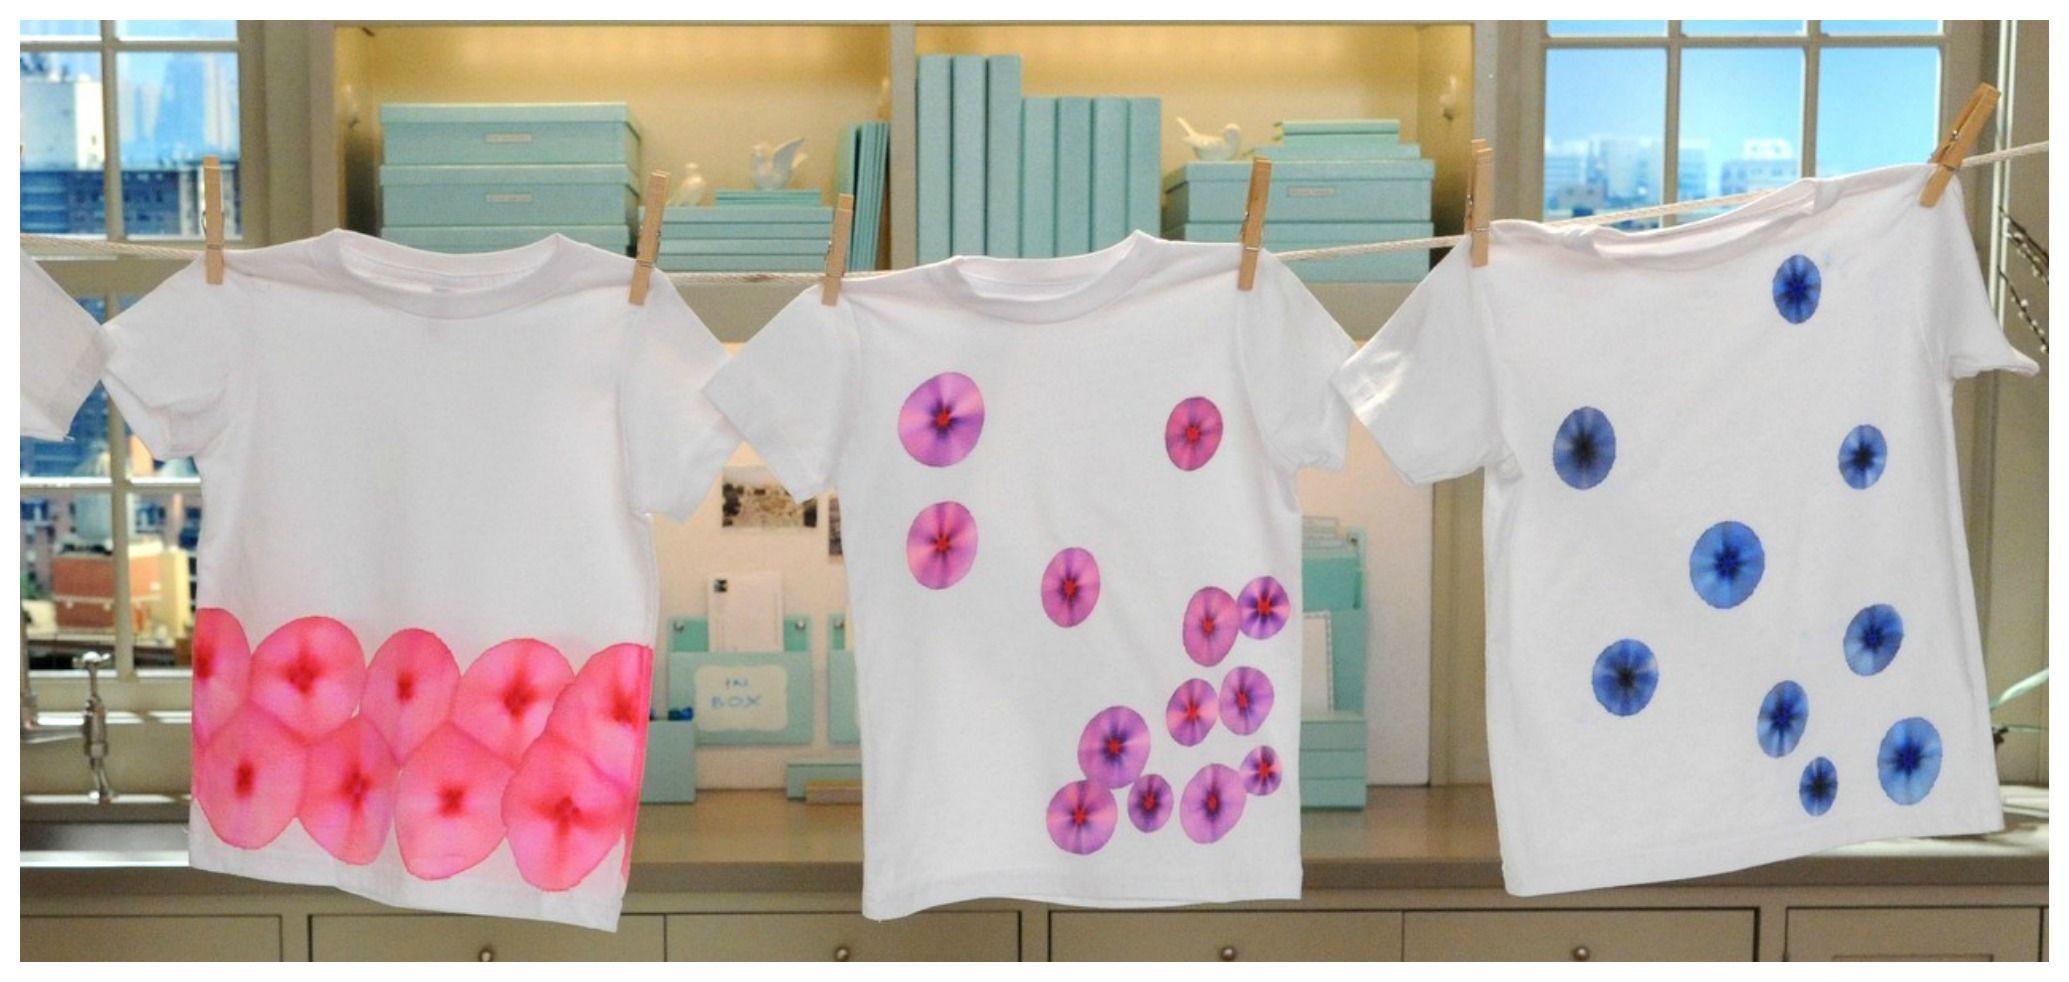 Idee geniali per stampare sui tessuti